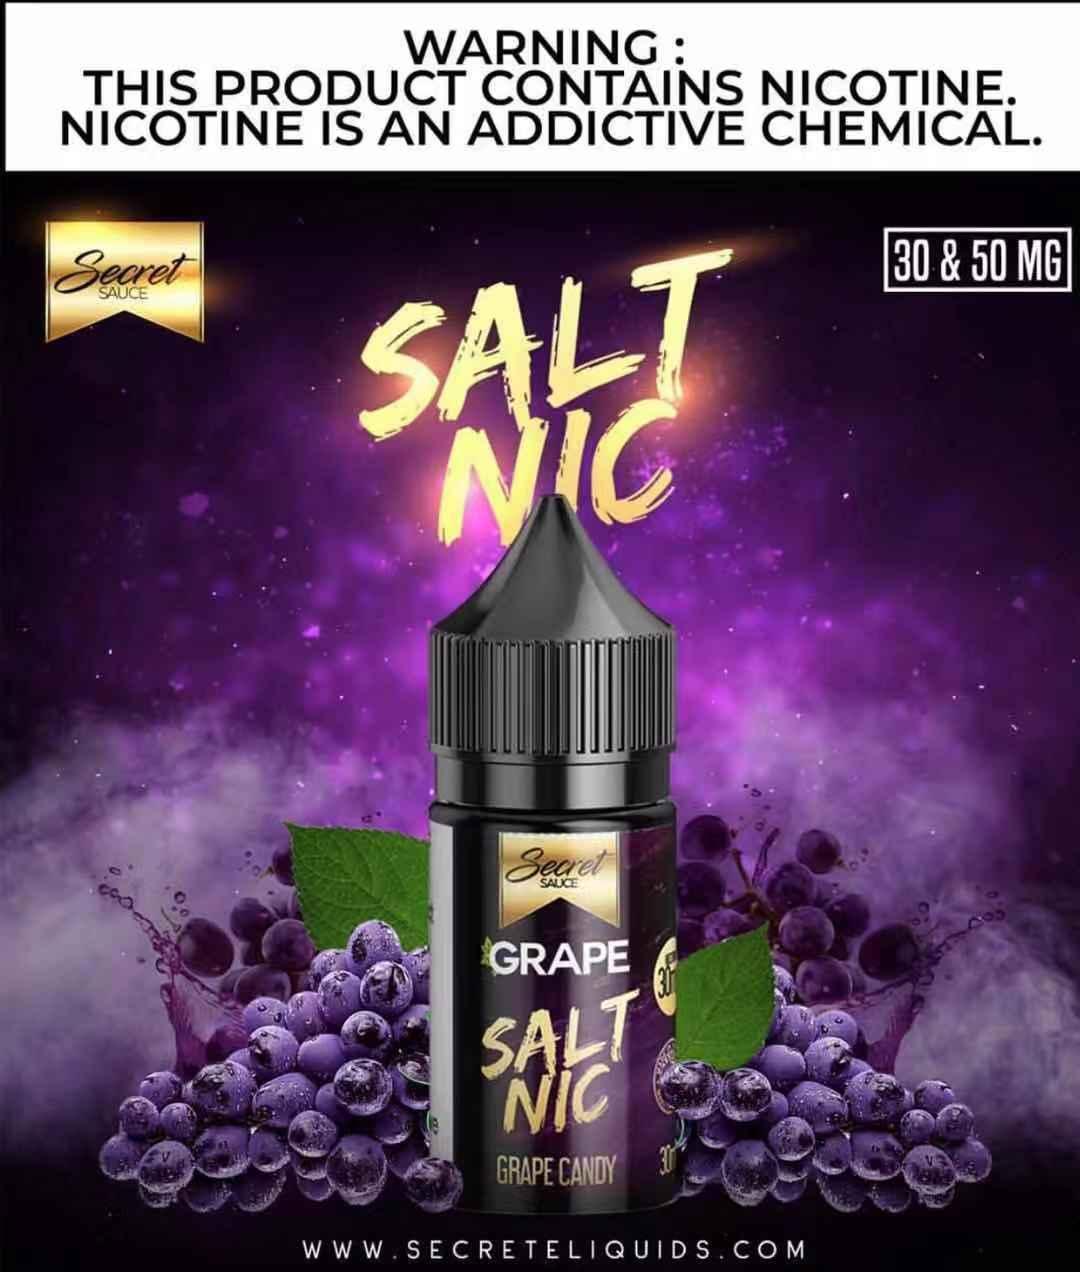 Secret Sauce Grape Salt Nic  oil    1